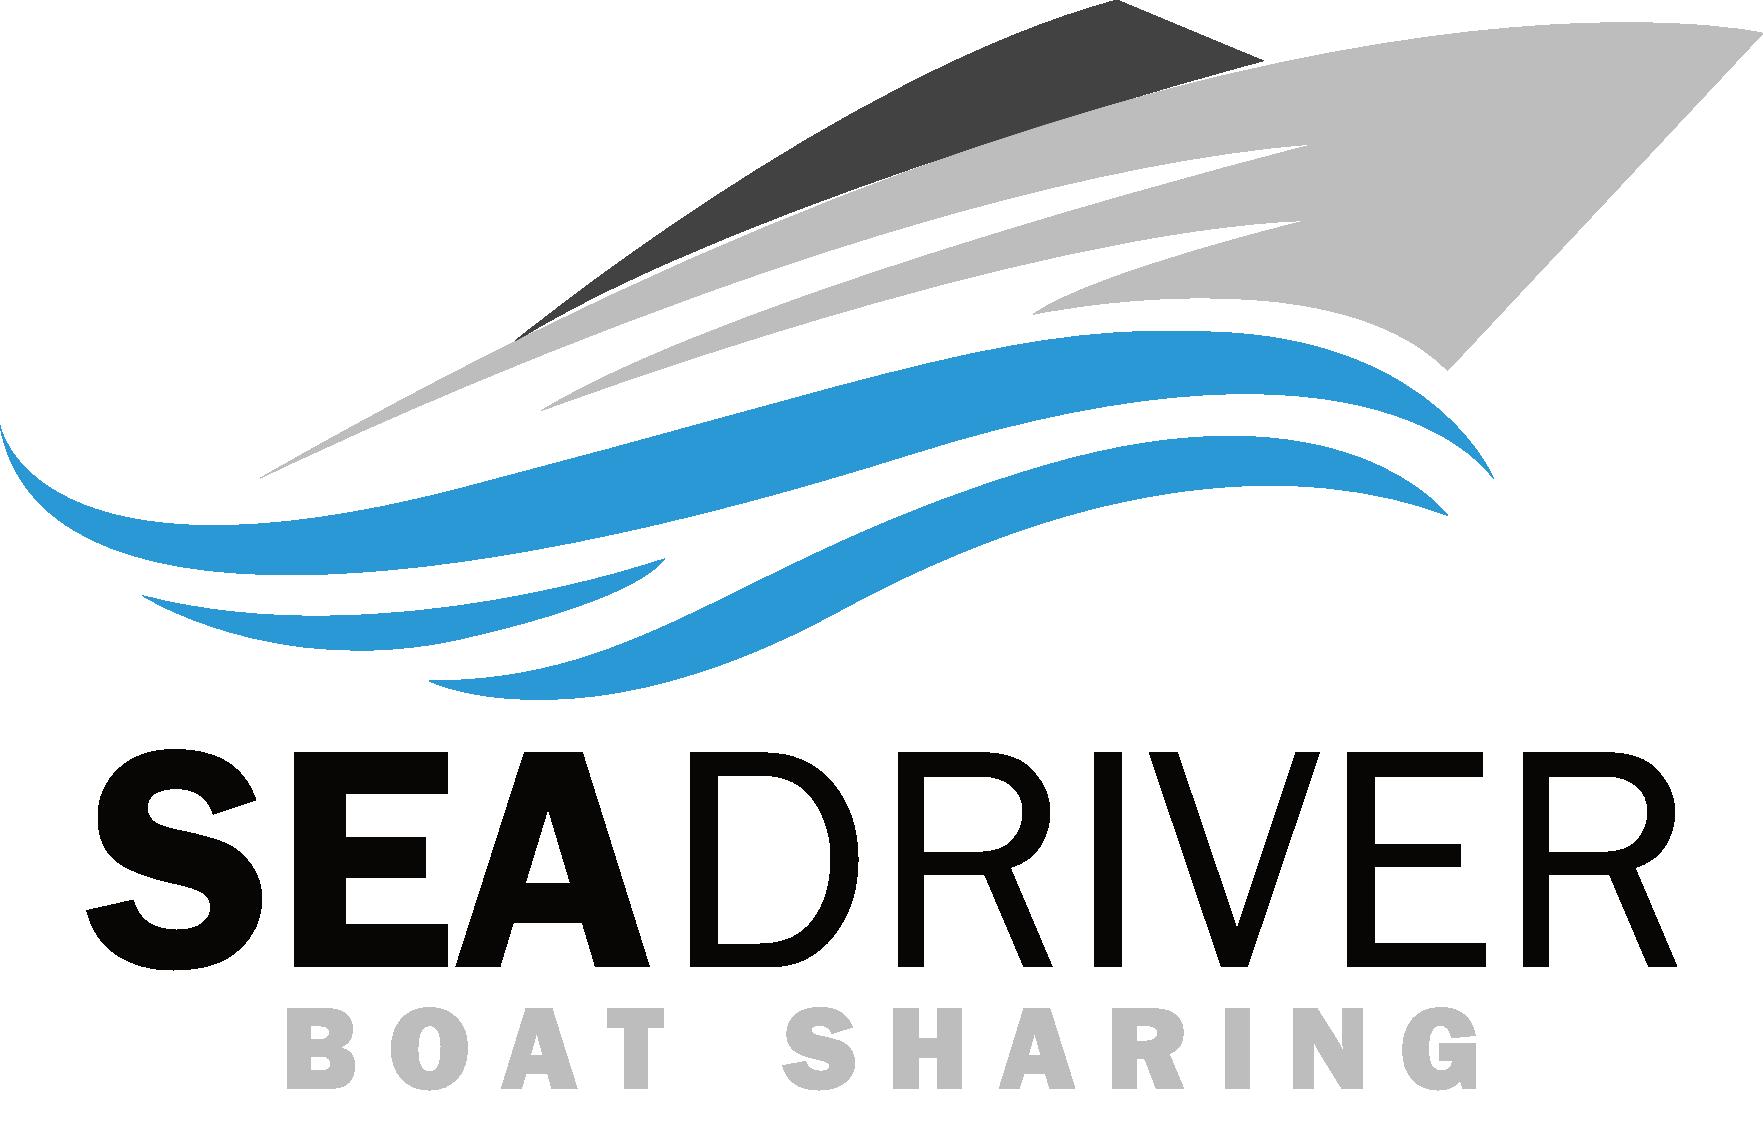 Seadriver